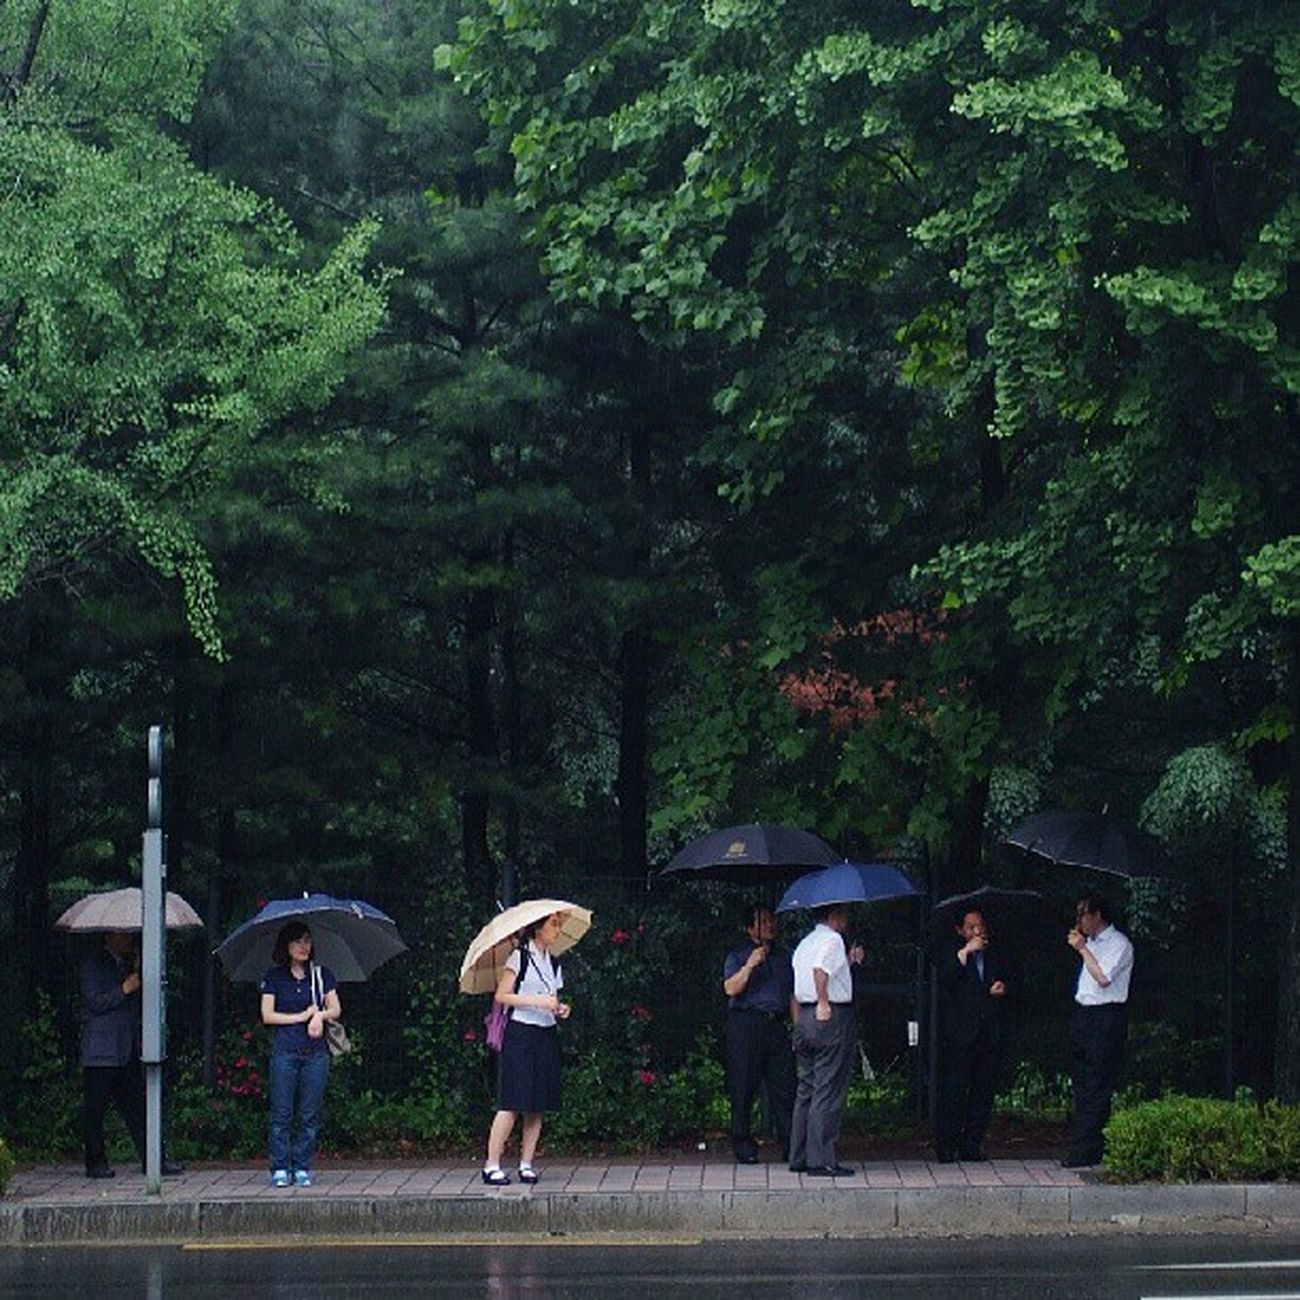 Robin_theme15 City of rain 빗소리가 반가운 아침 신림동